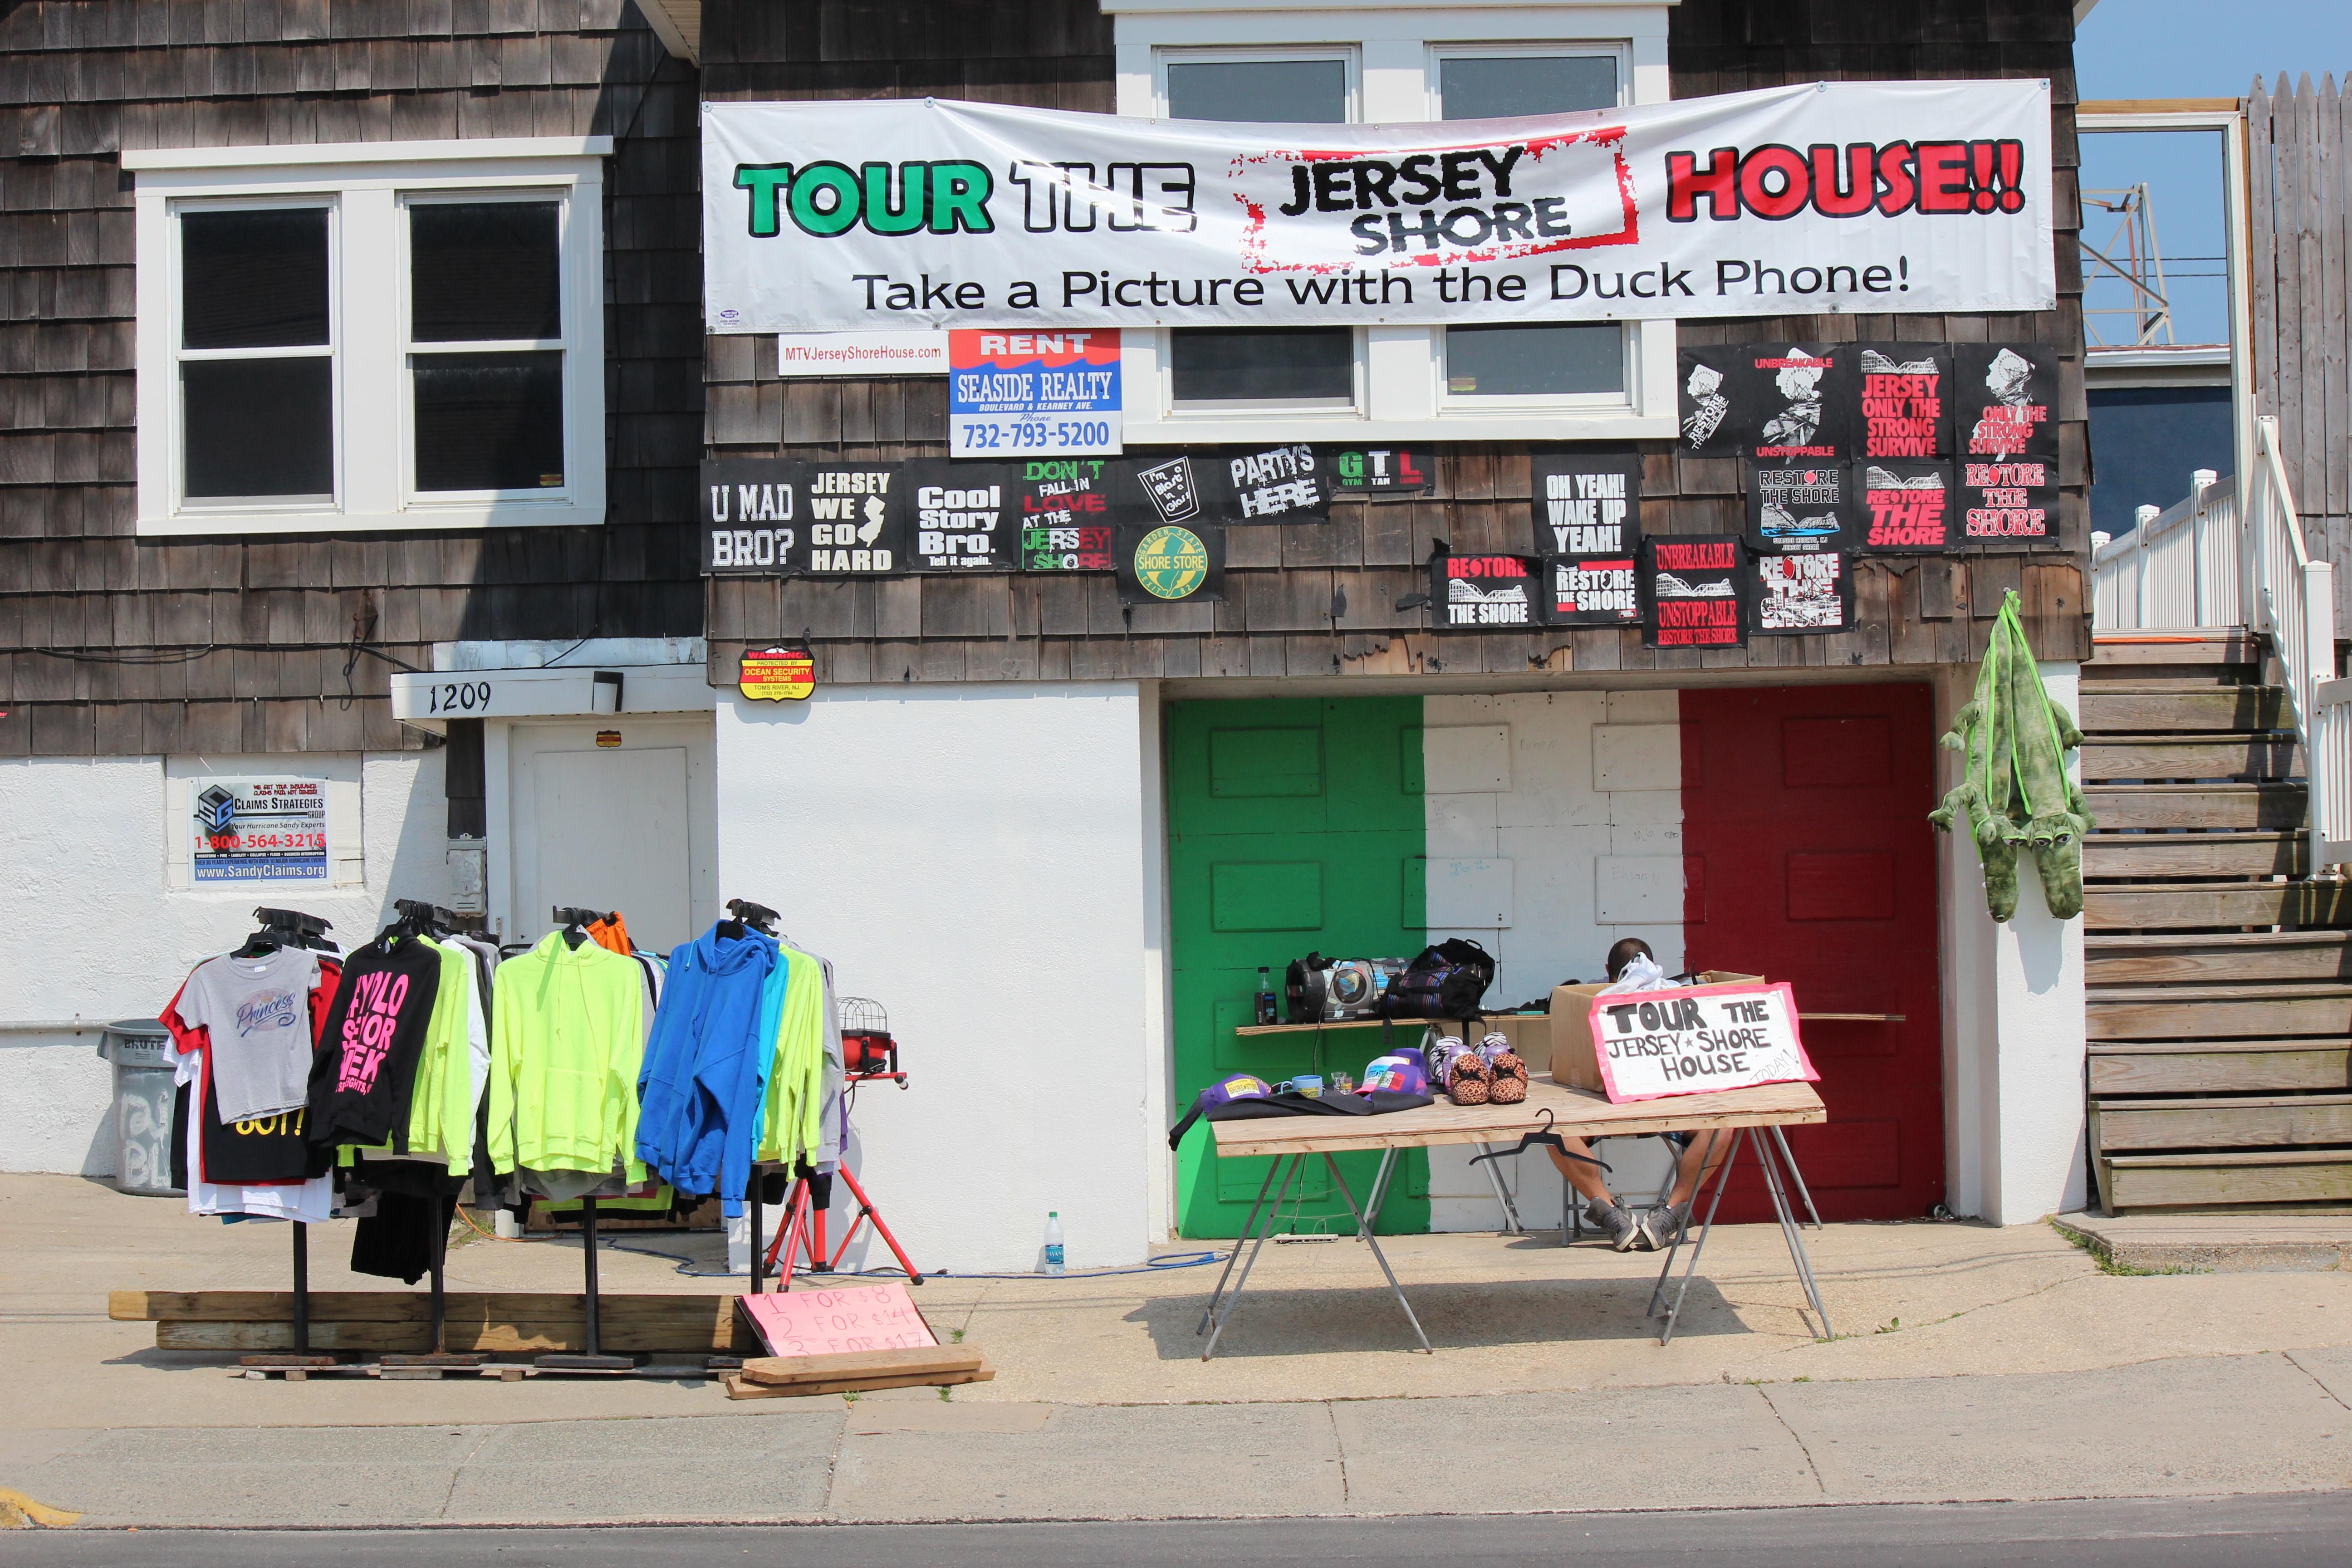 Jersey Shore House Tour Tickets